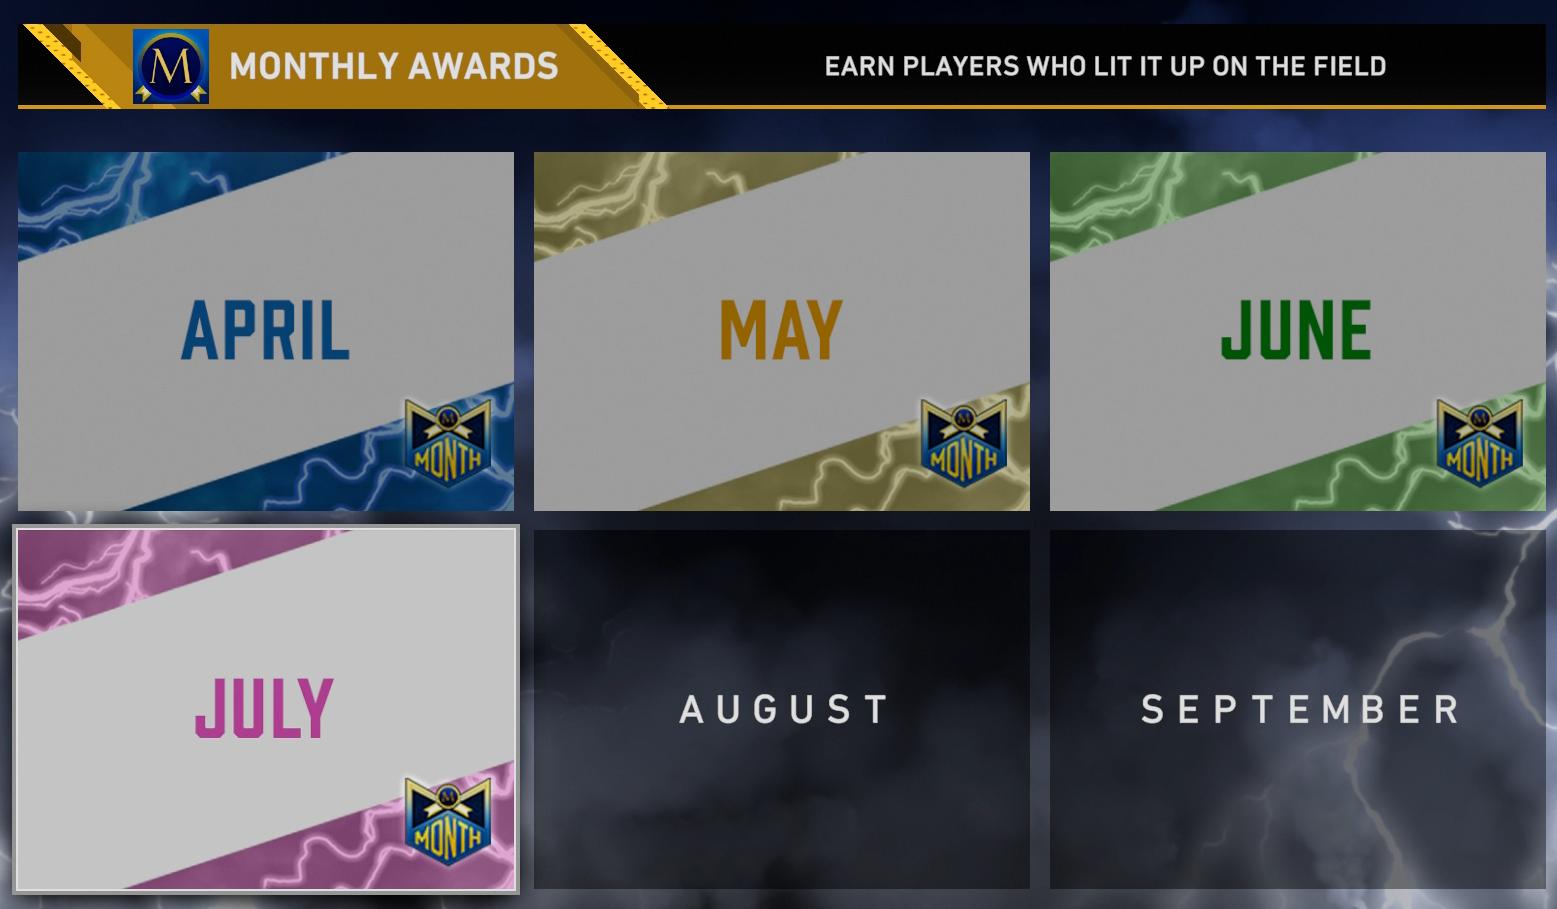 july monthly awards program